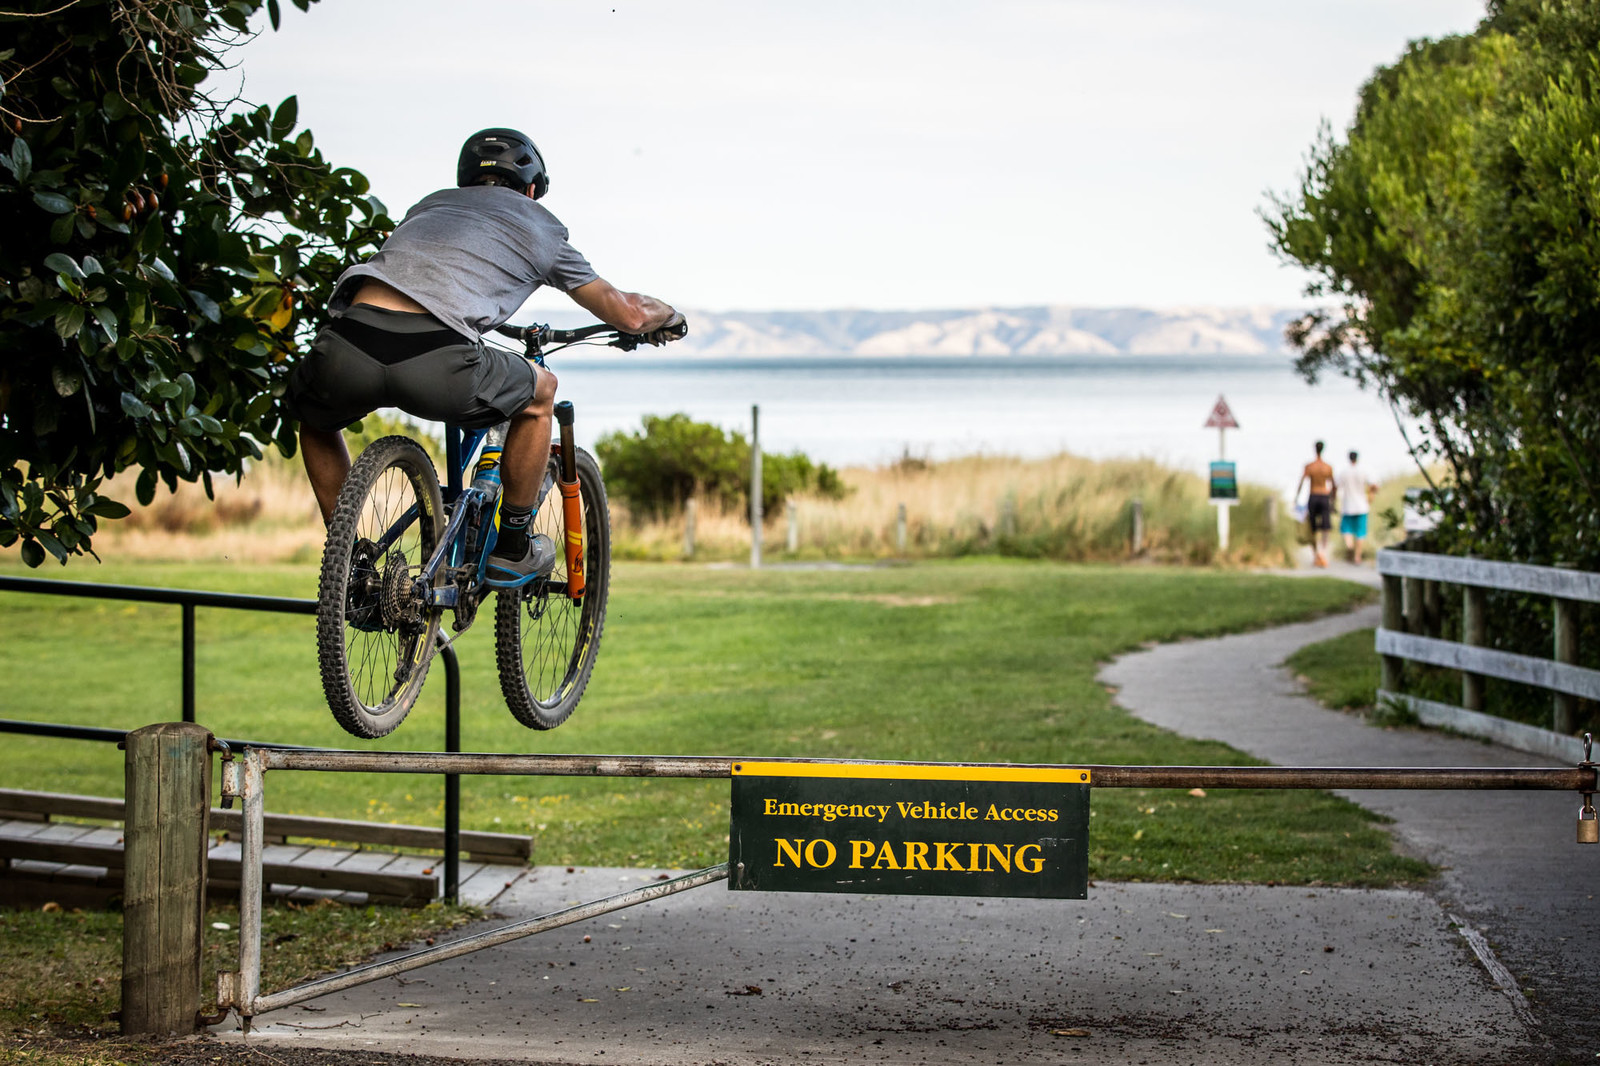 NZEnduro19 BB 898A8991 - 2019 NZ Enduro Day 1 Photo Gallery - Mountain Biking Pictures - Vital MTB